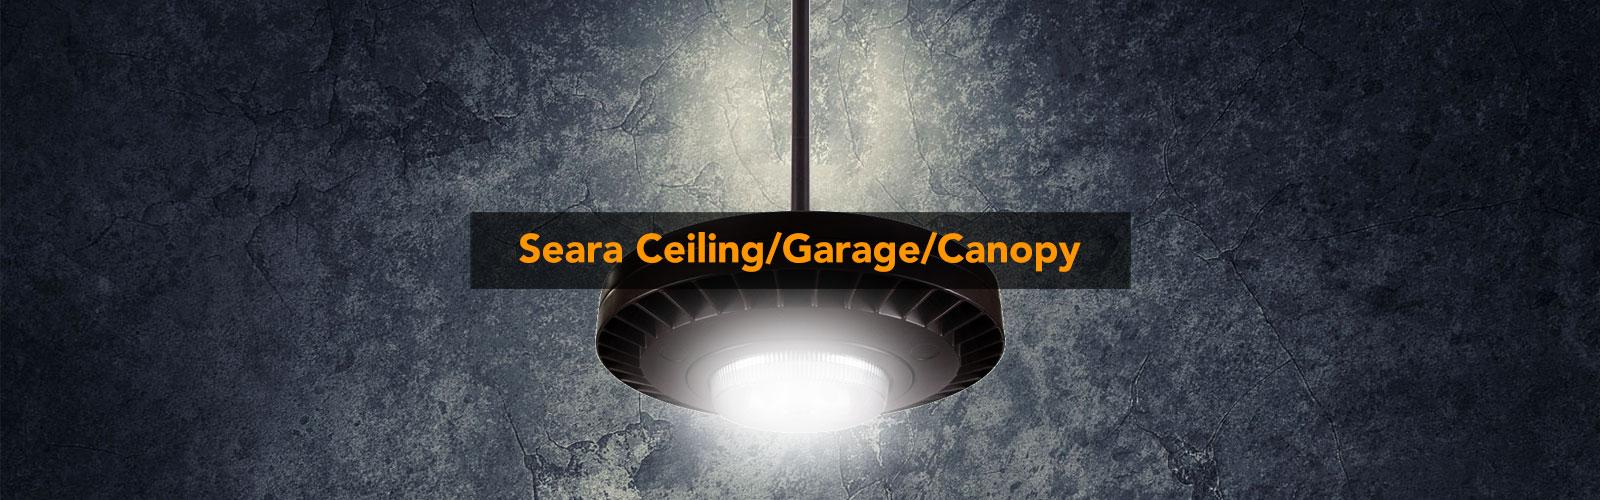 Seara Ceiling